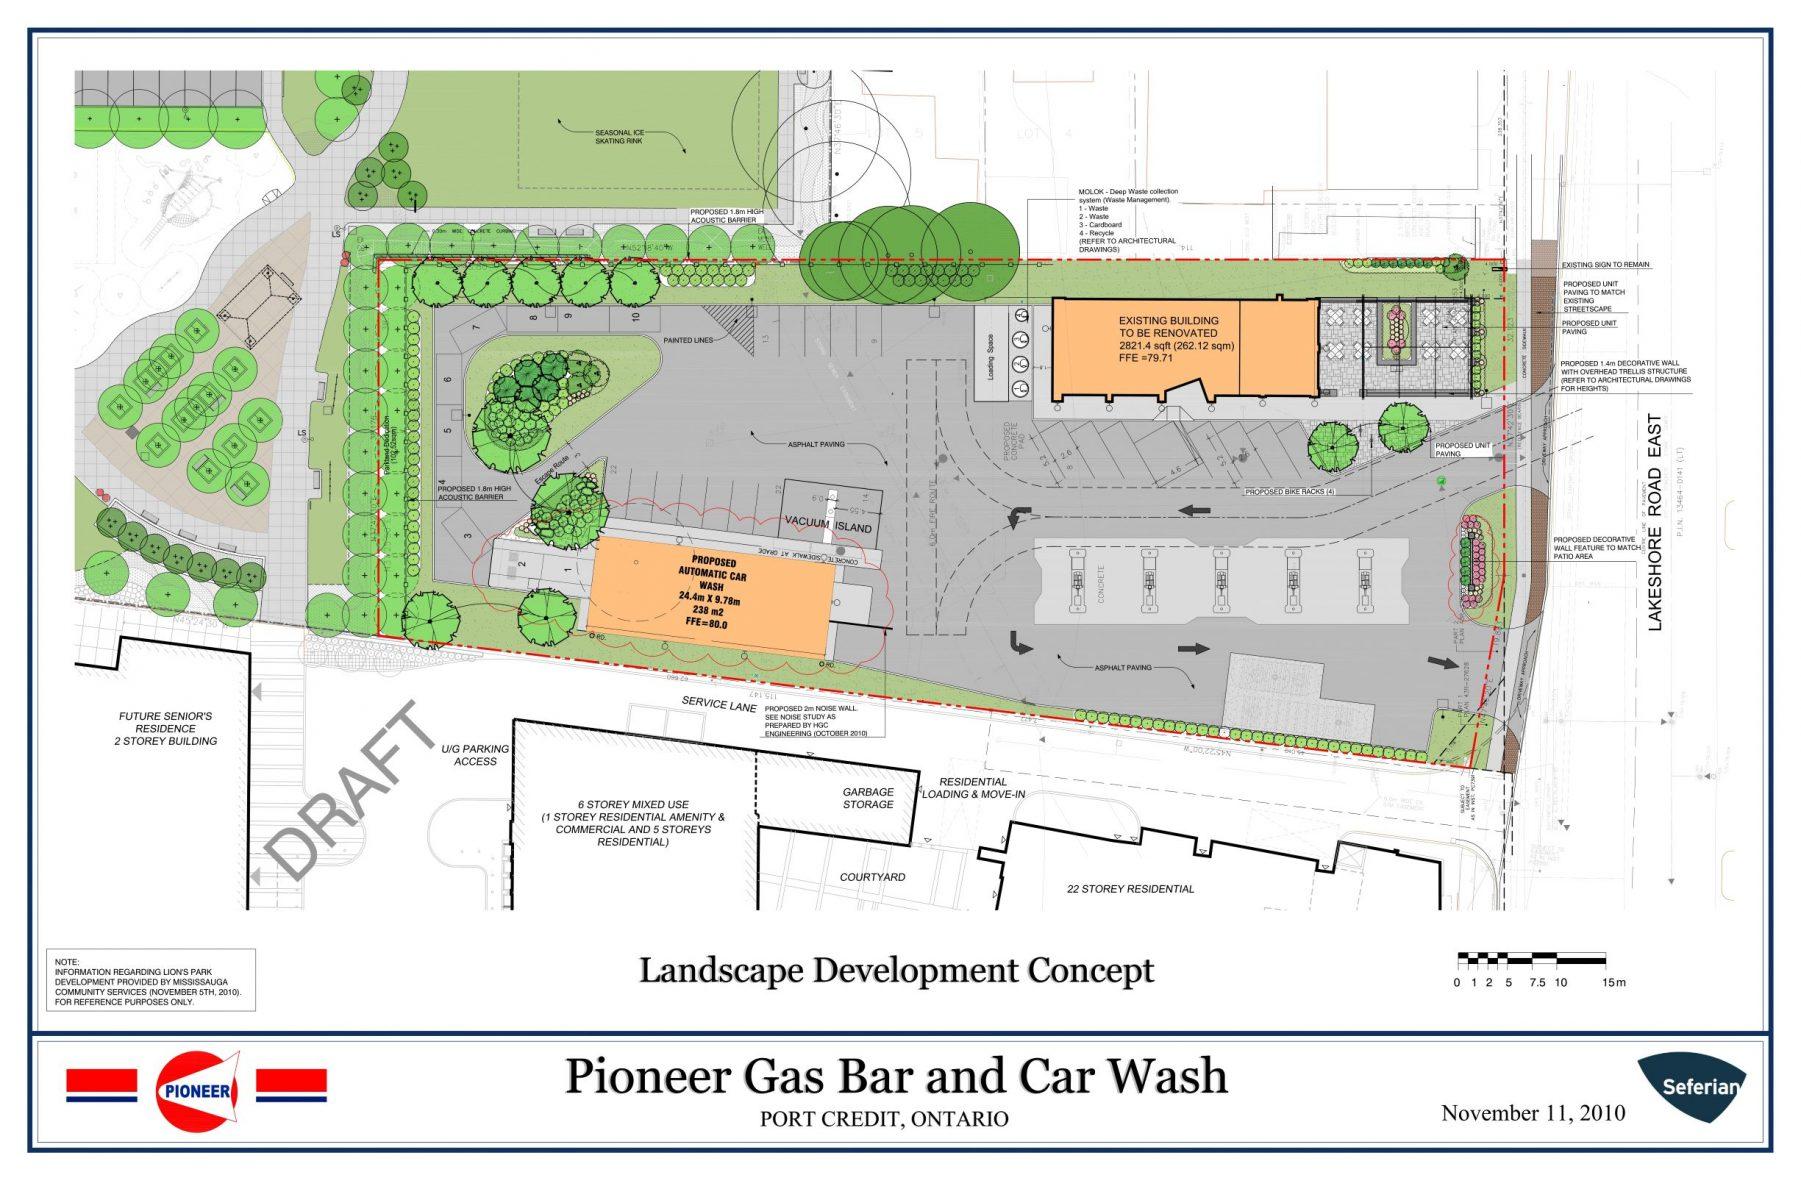 Korsiak Urban Planning - Mississauga Portfolio - Pioneer Gas Bar Port Credit, Commercial Development - Mississauga, Ontario